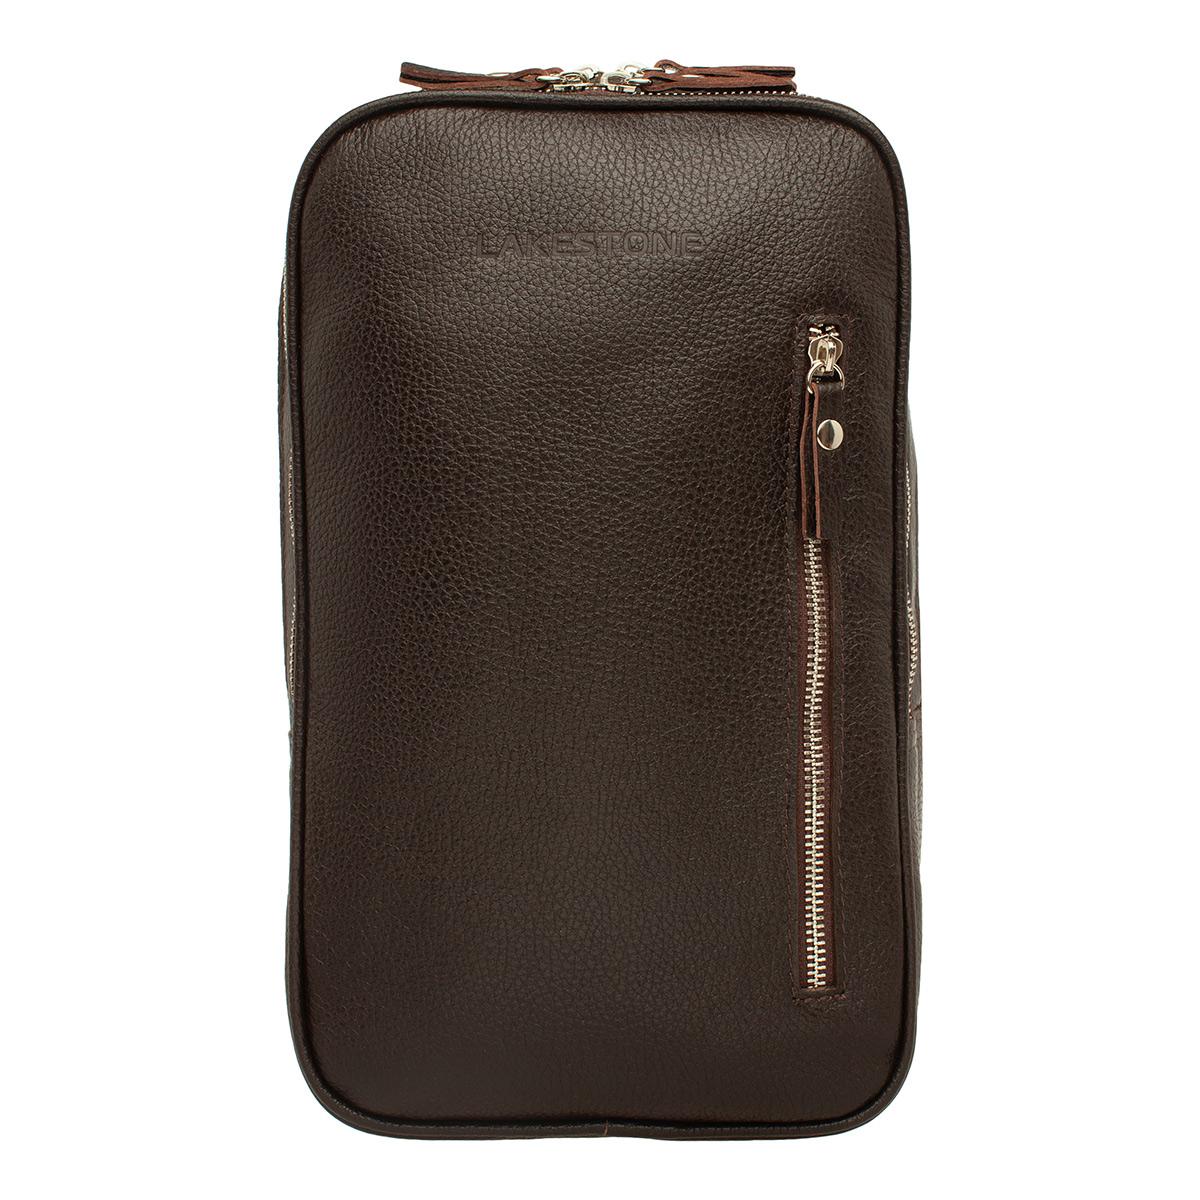 Рюкзак на одной лямке Scott Brown фото